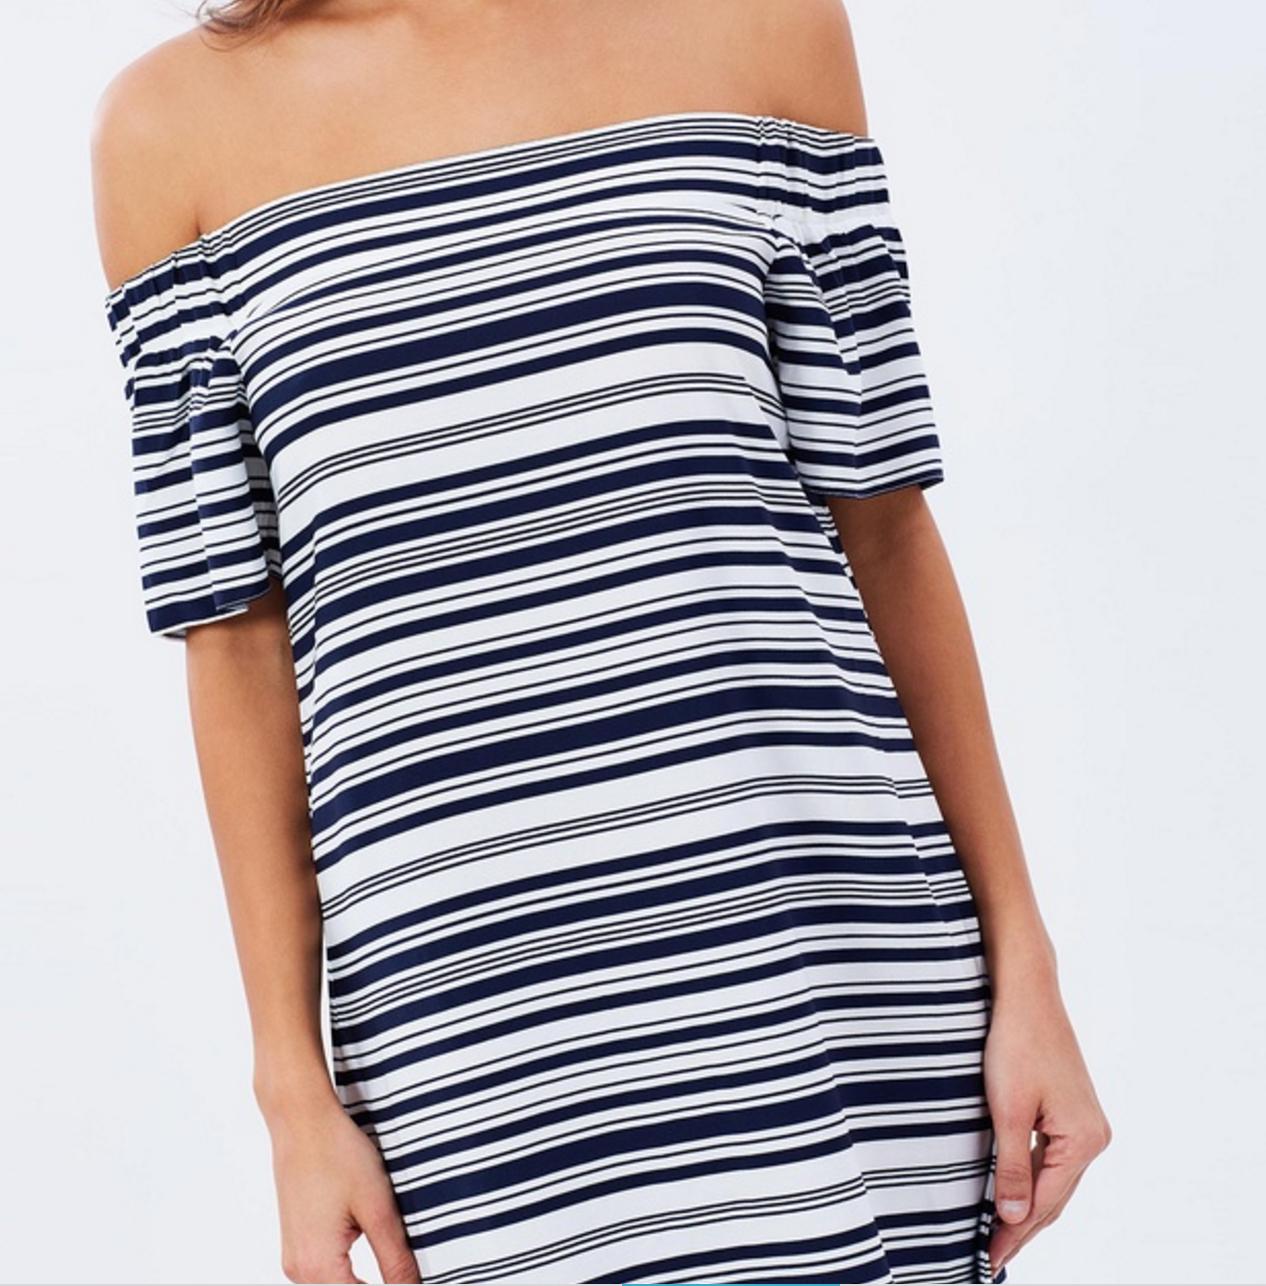 Atmos & Here Heidi off shoulder dress $59.95